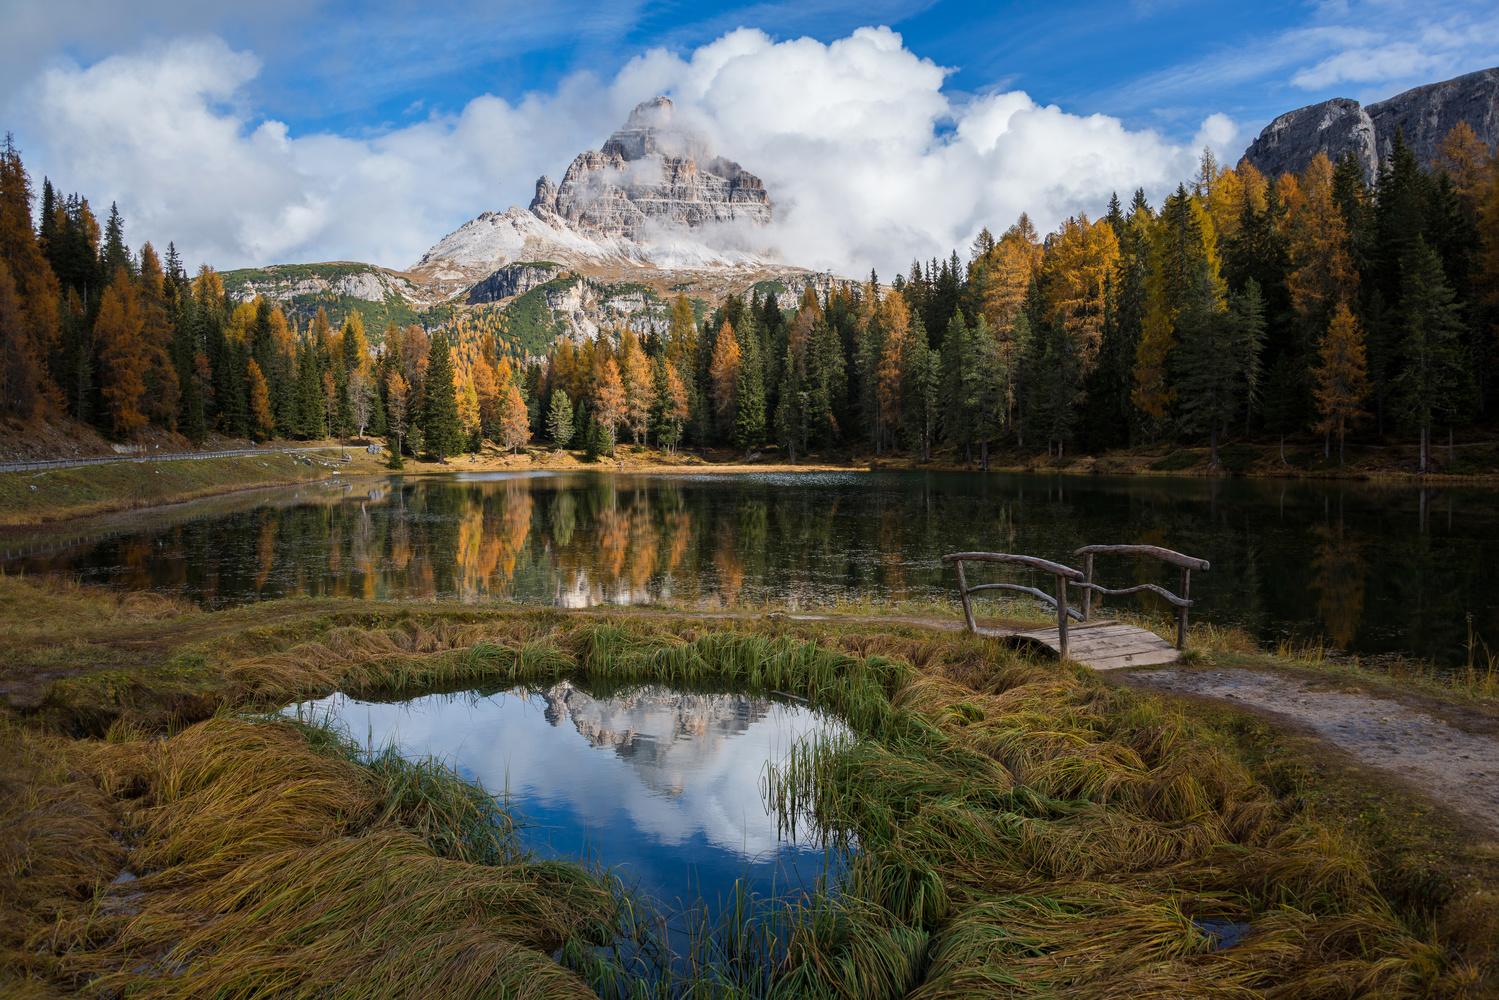 Lake Antorno by Ales Krivec